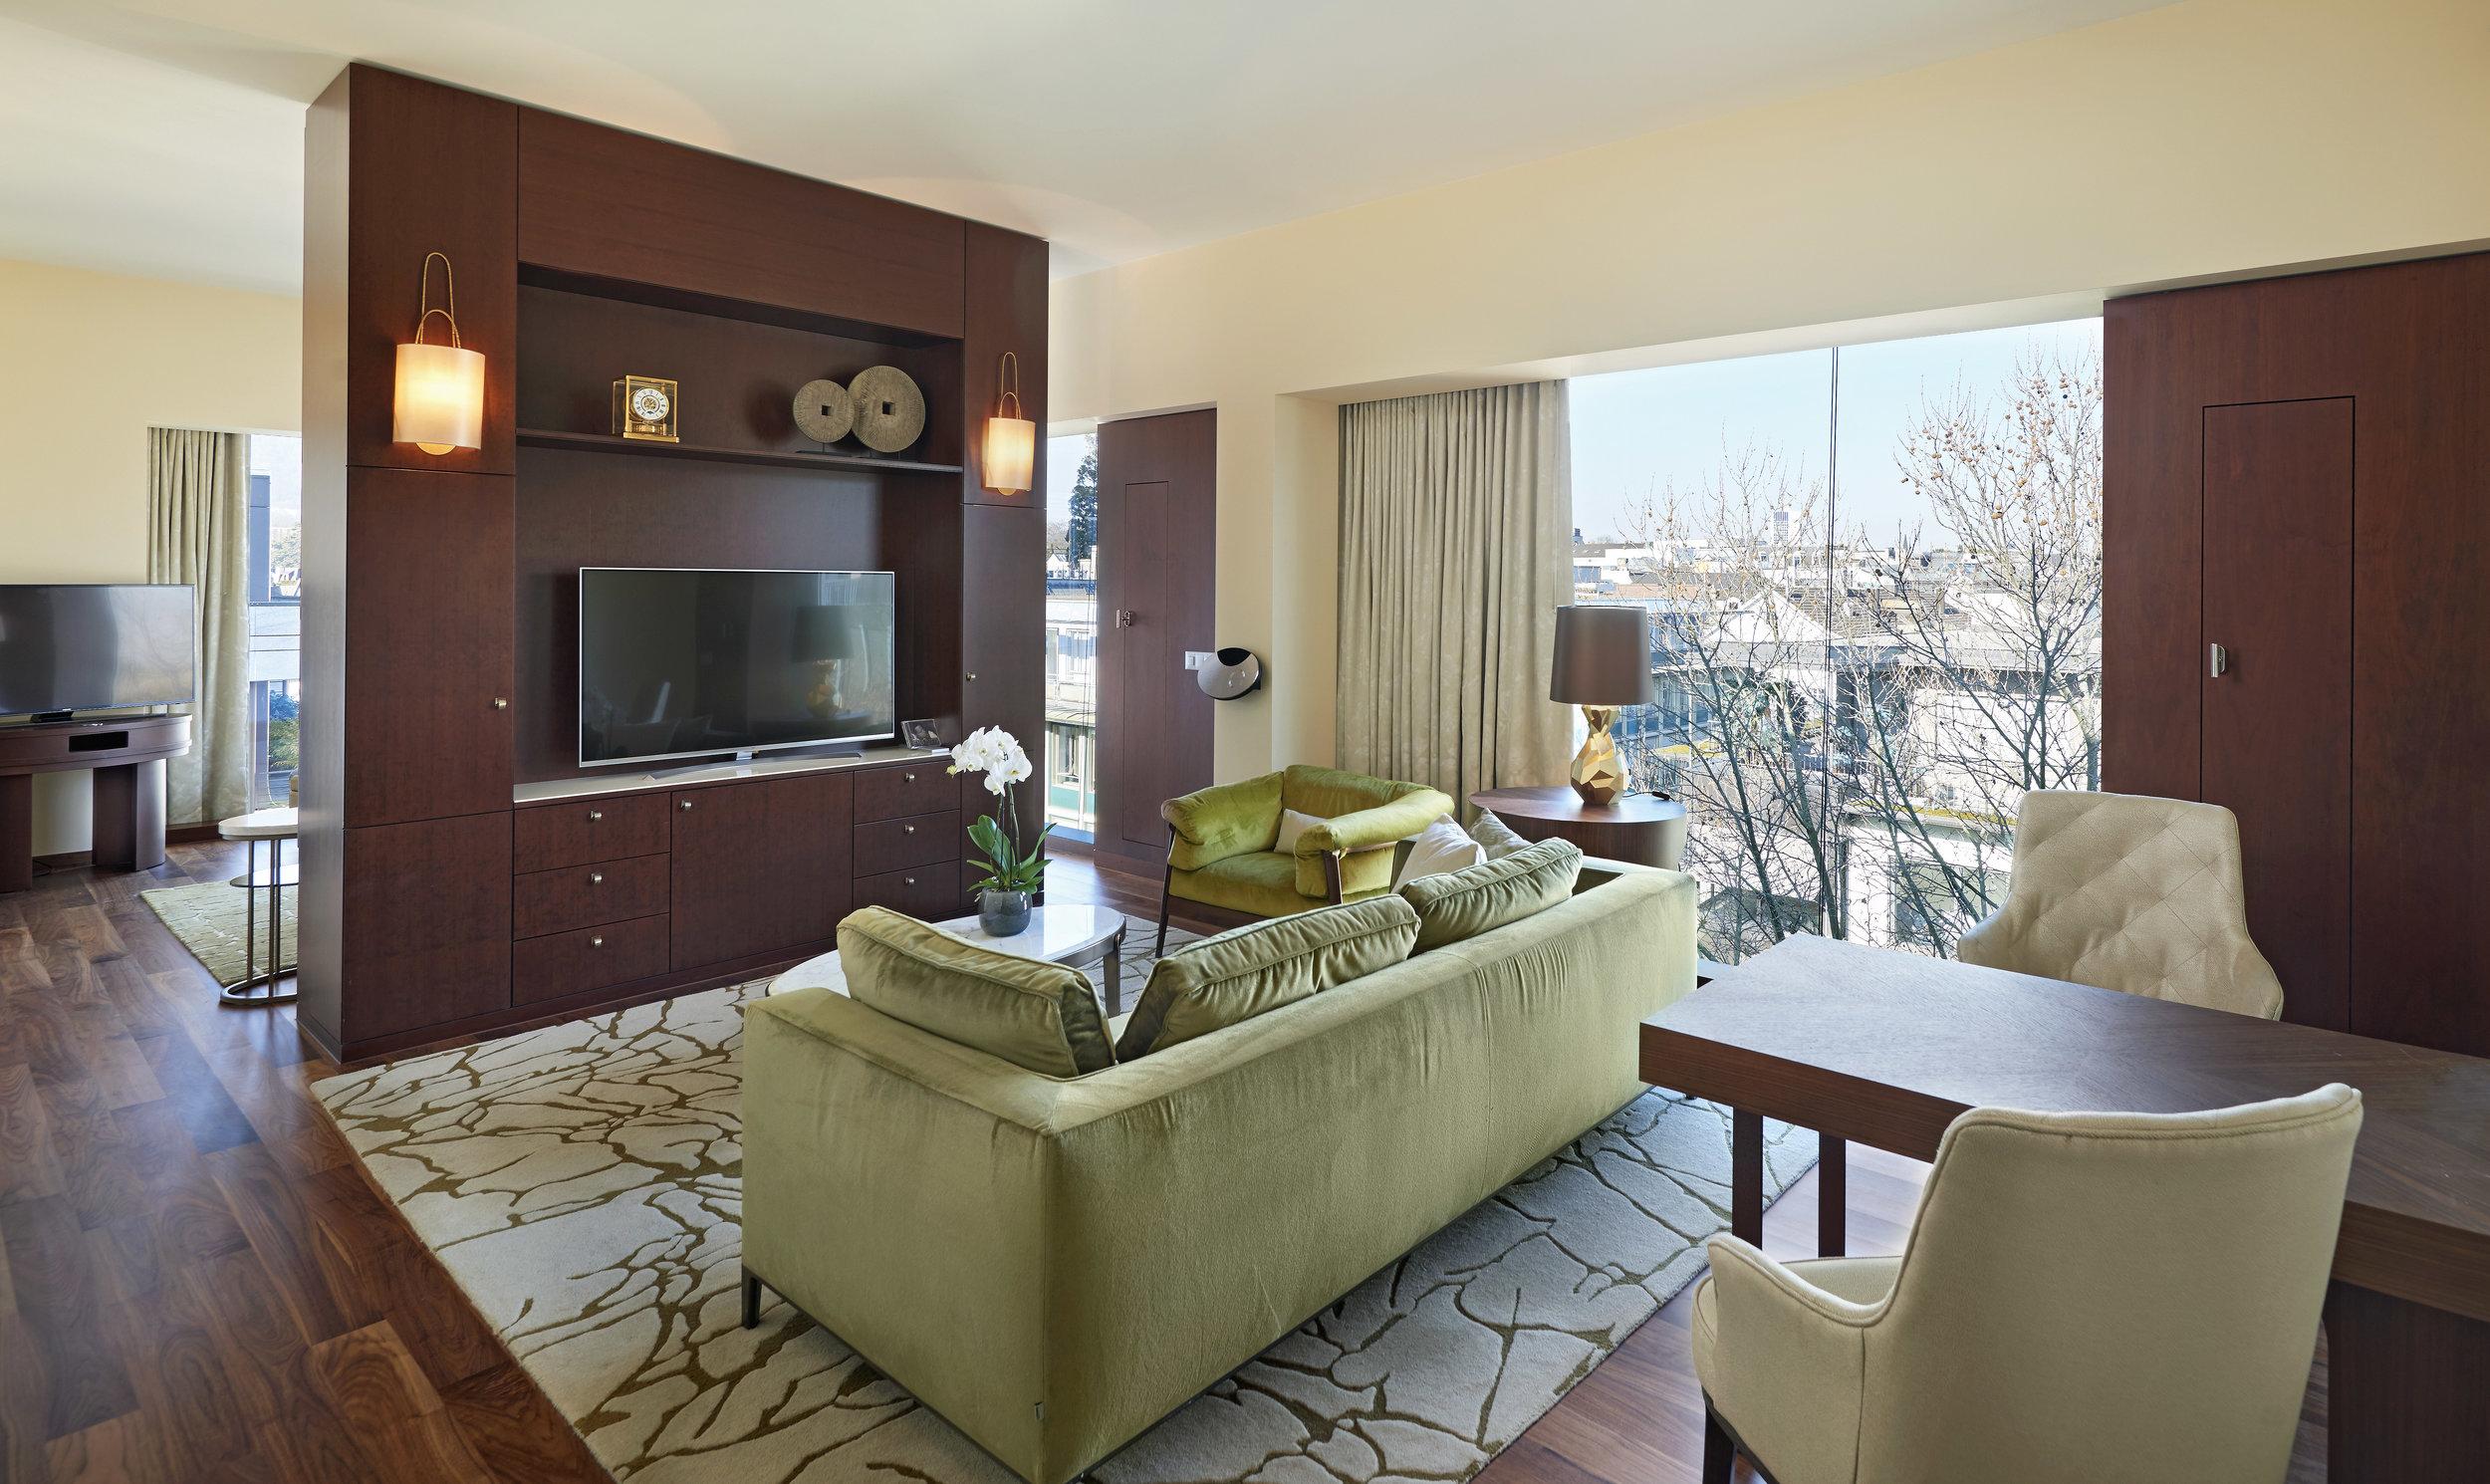 Livingroom - Un'area con una vista unica sul panorama del 6º piano del Park Hyatt, Zürich: la TV 55